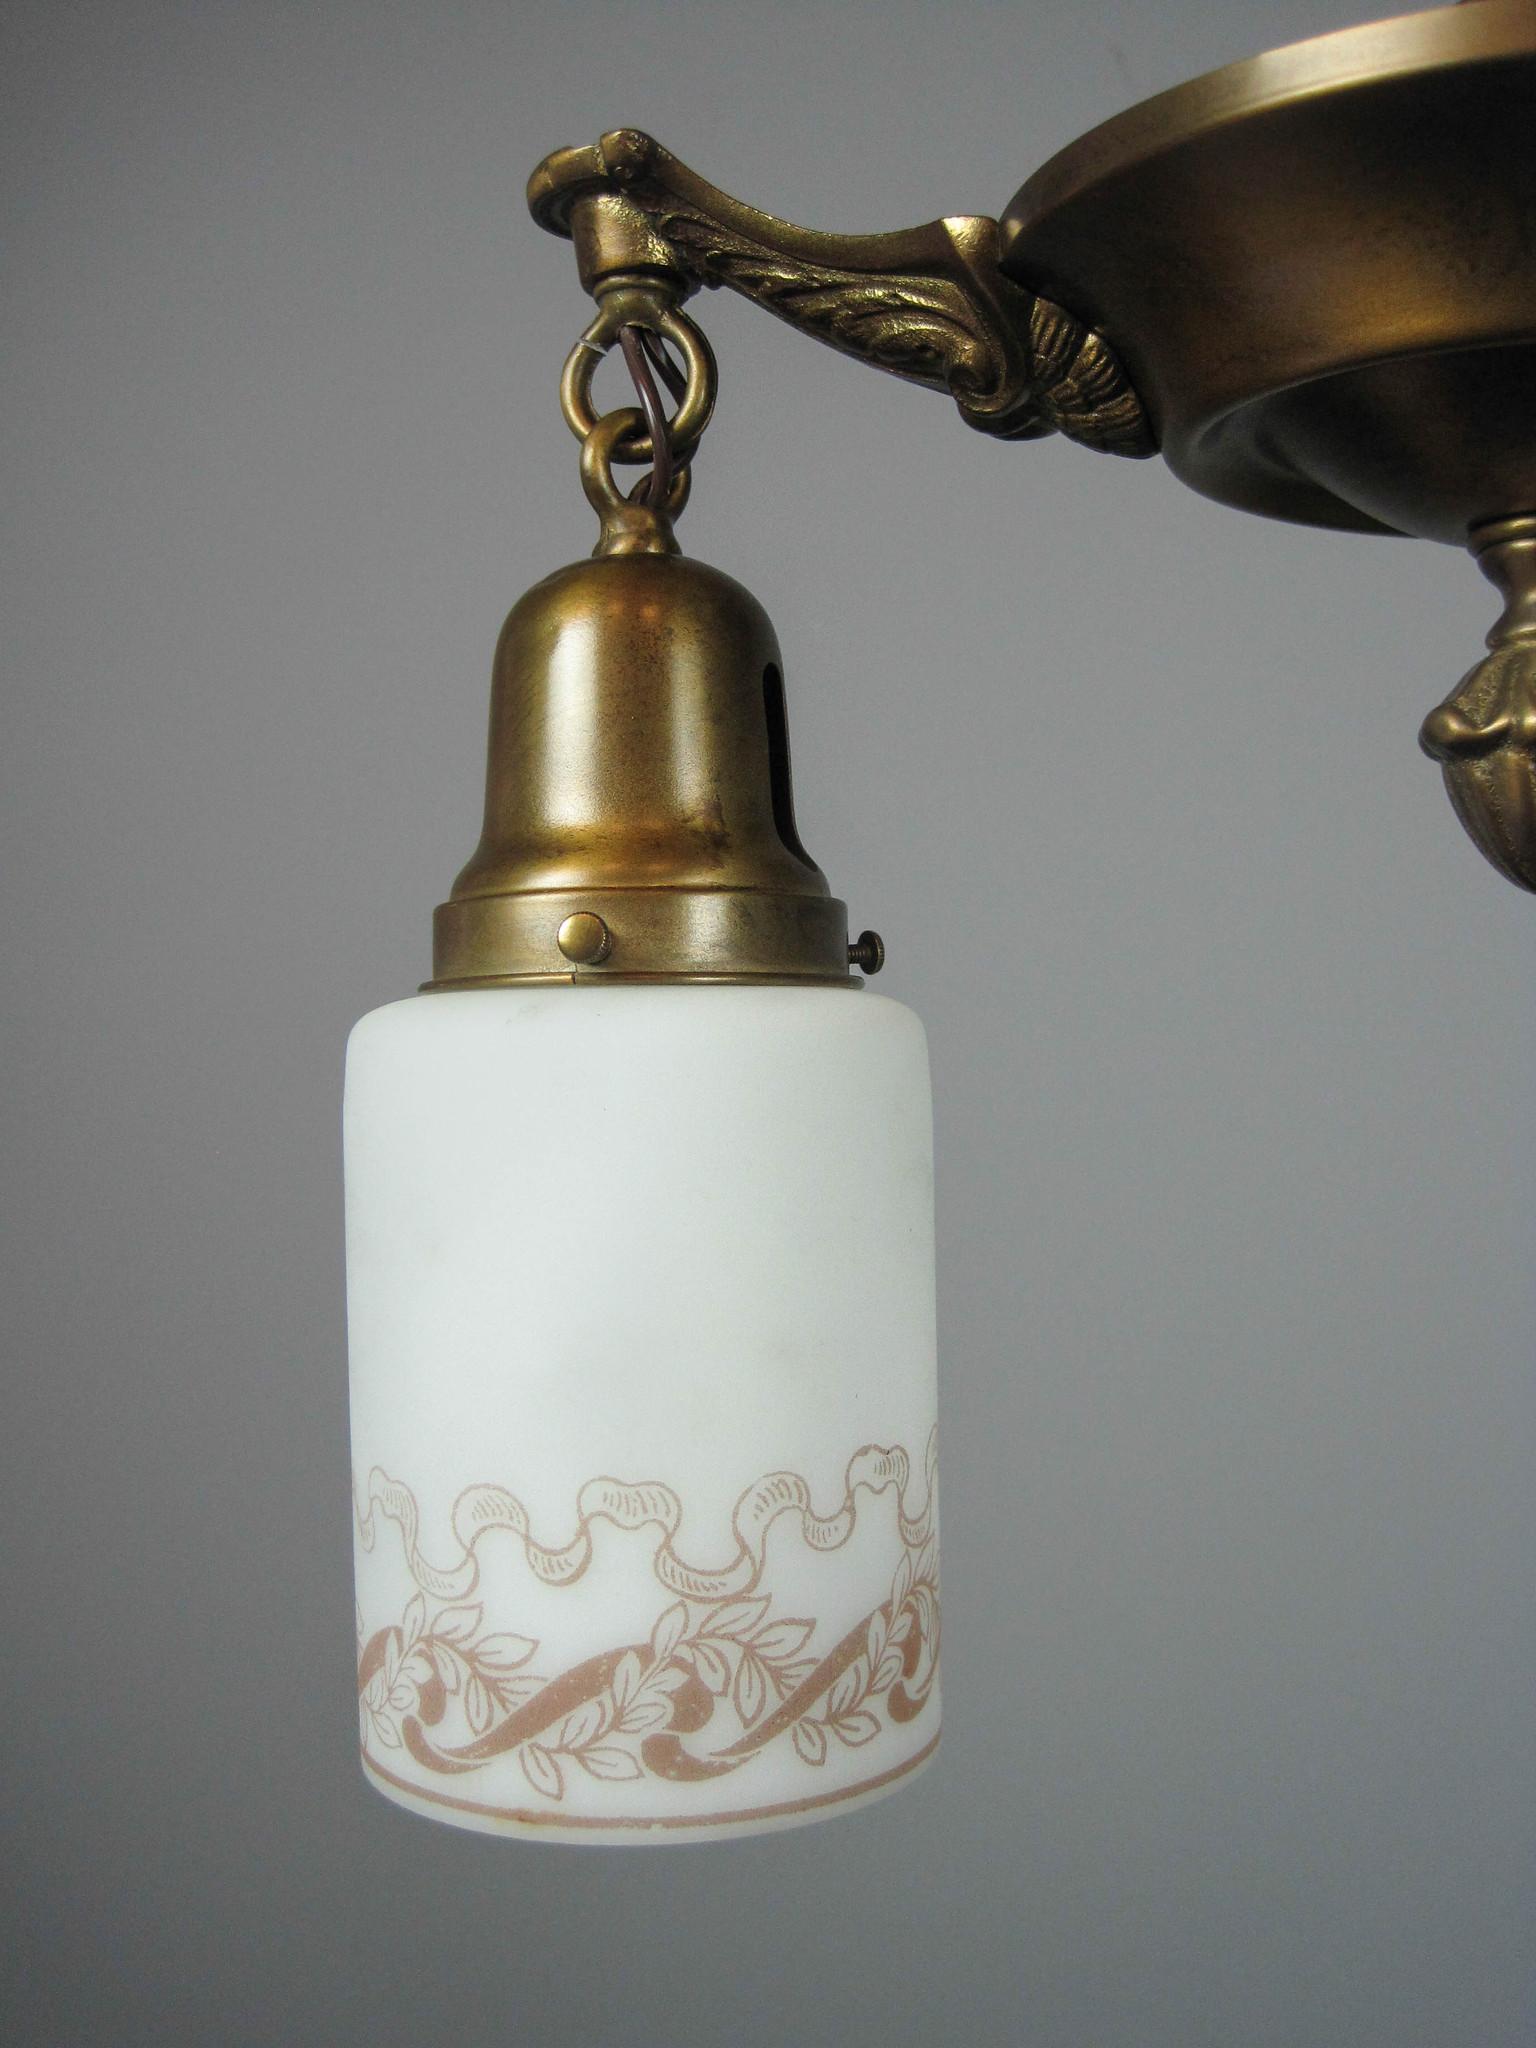 Heritage Lighting Gallery